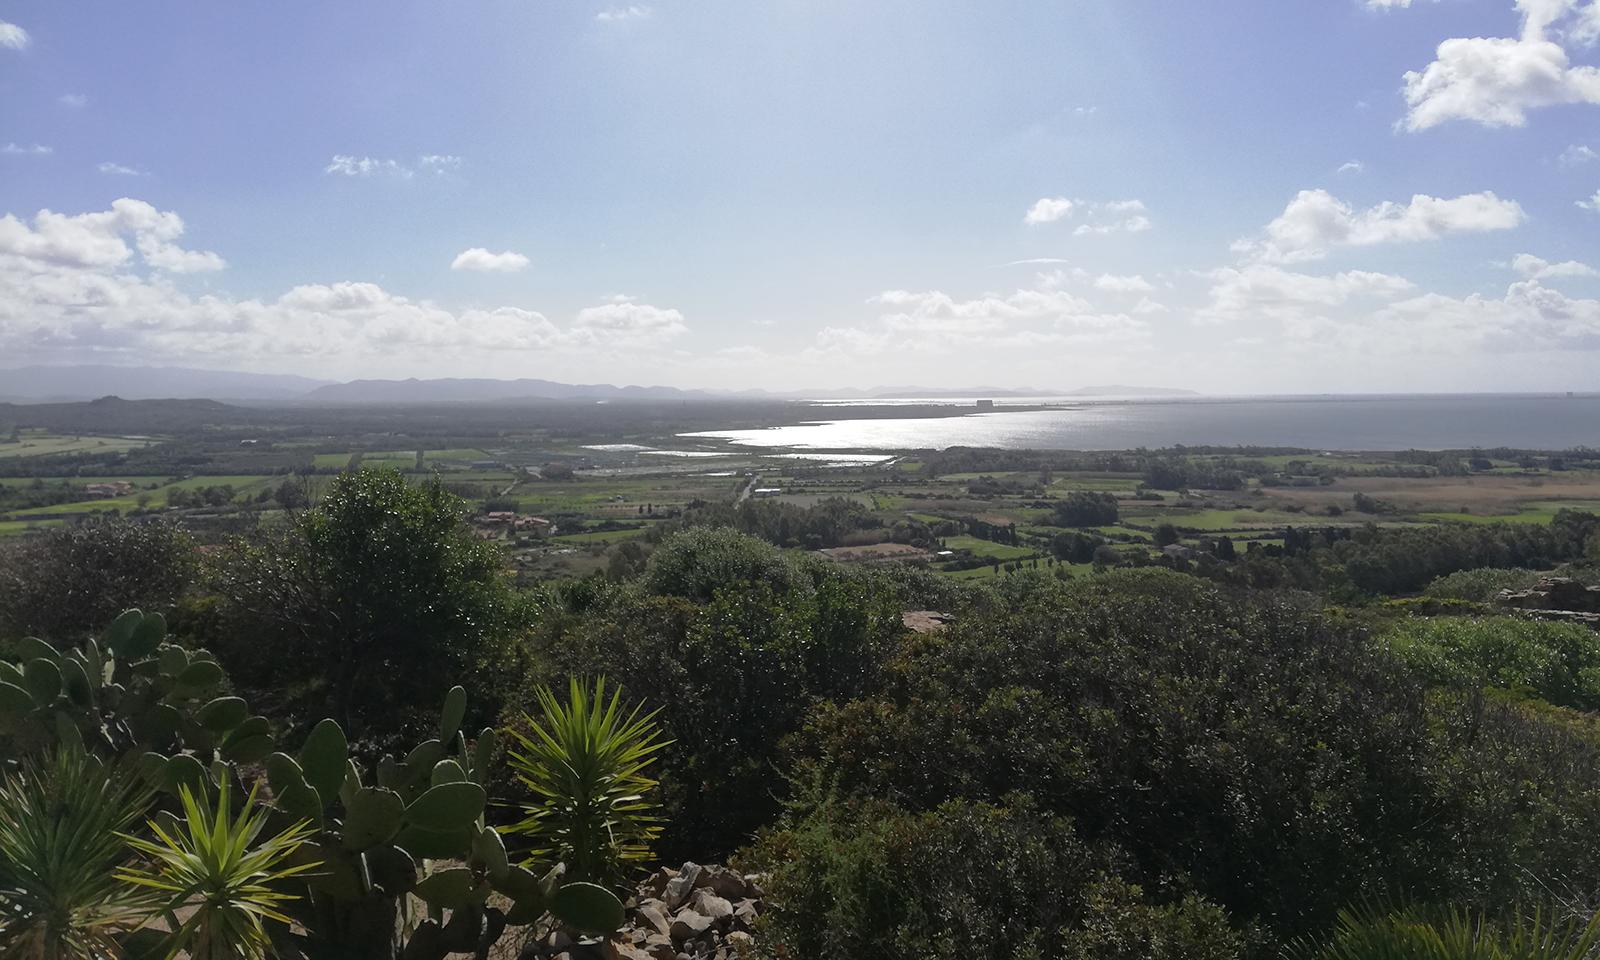 Figli del vento: Sardegna, Punta Trettu